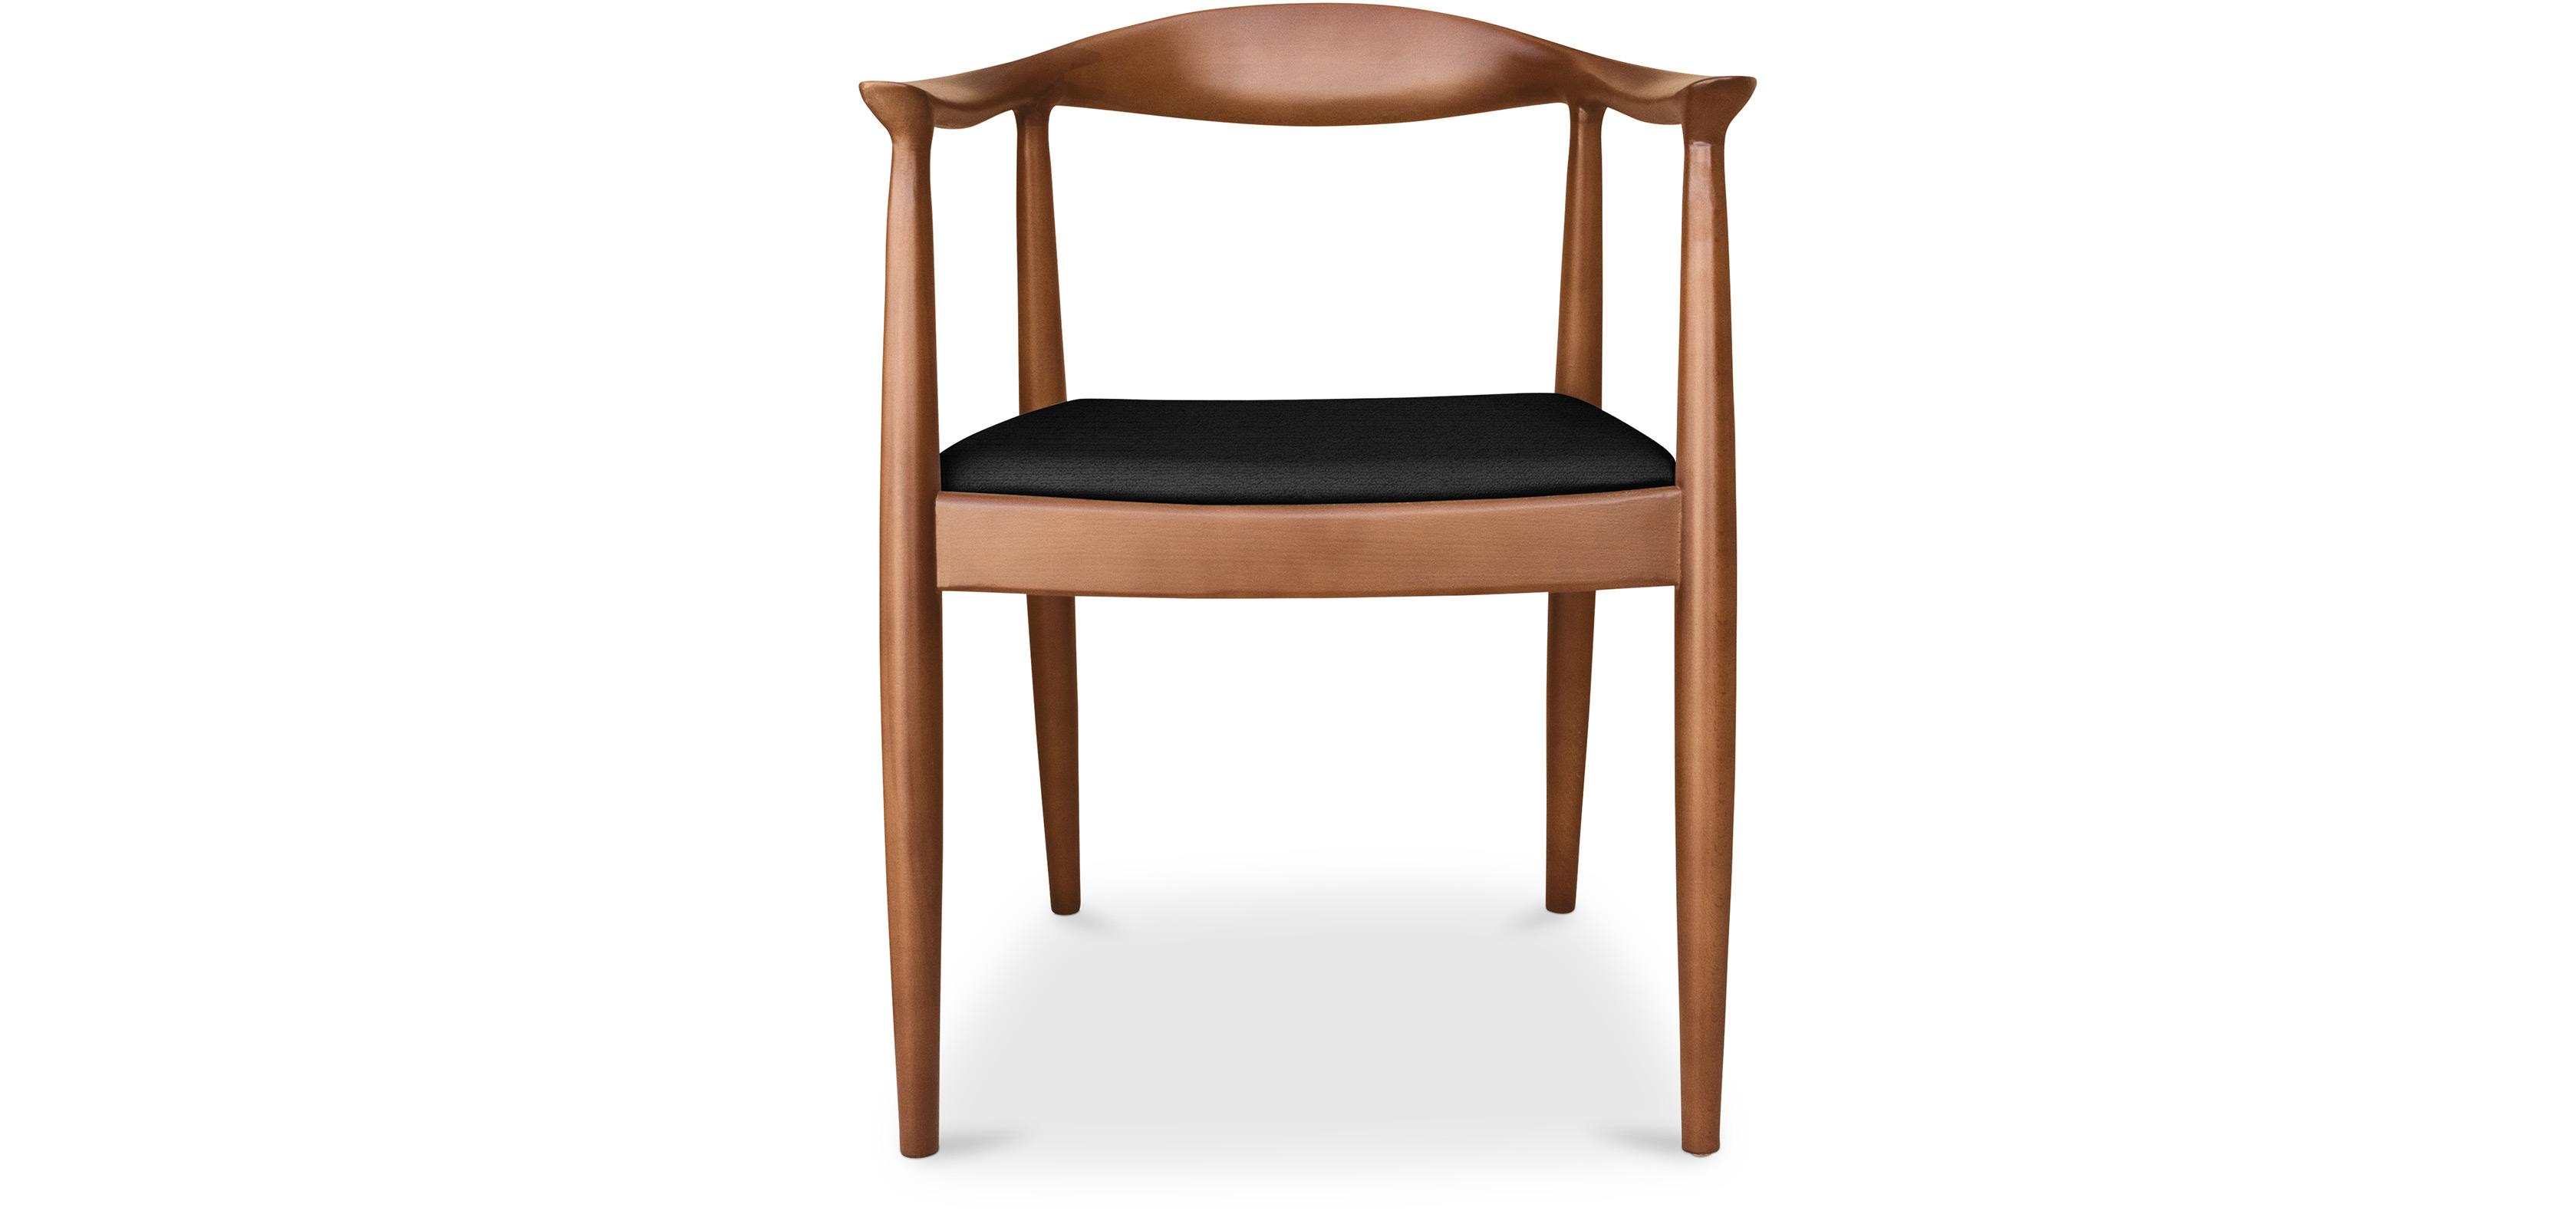 The Chair Scandinavian Design Hans J Wegner Style